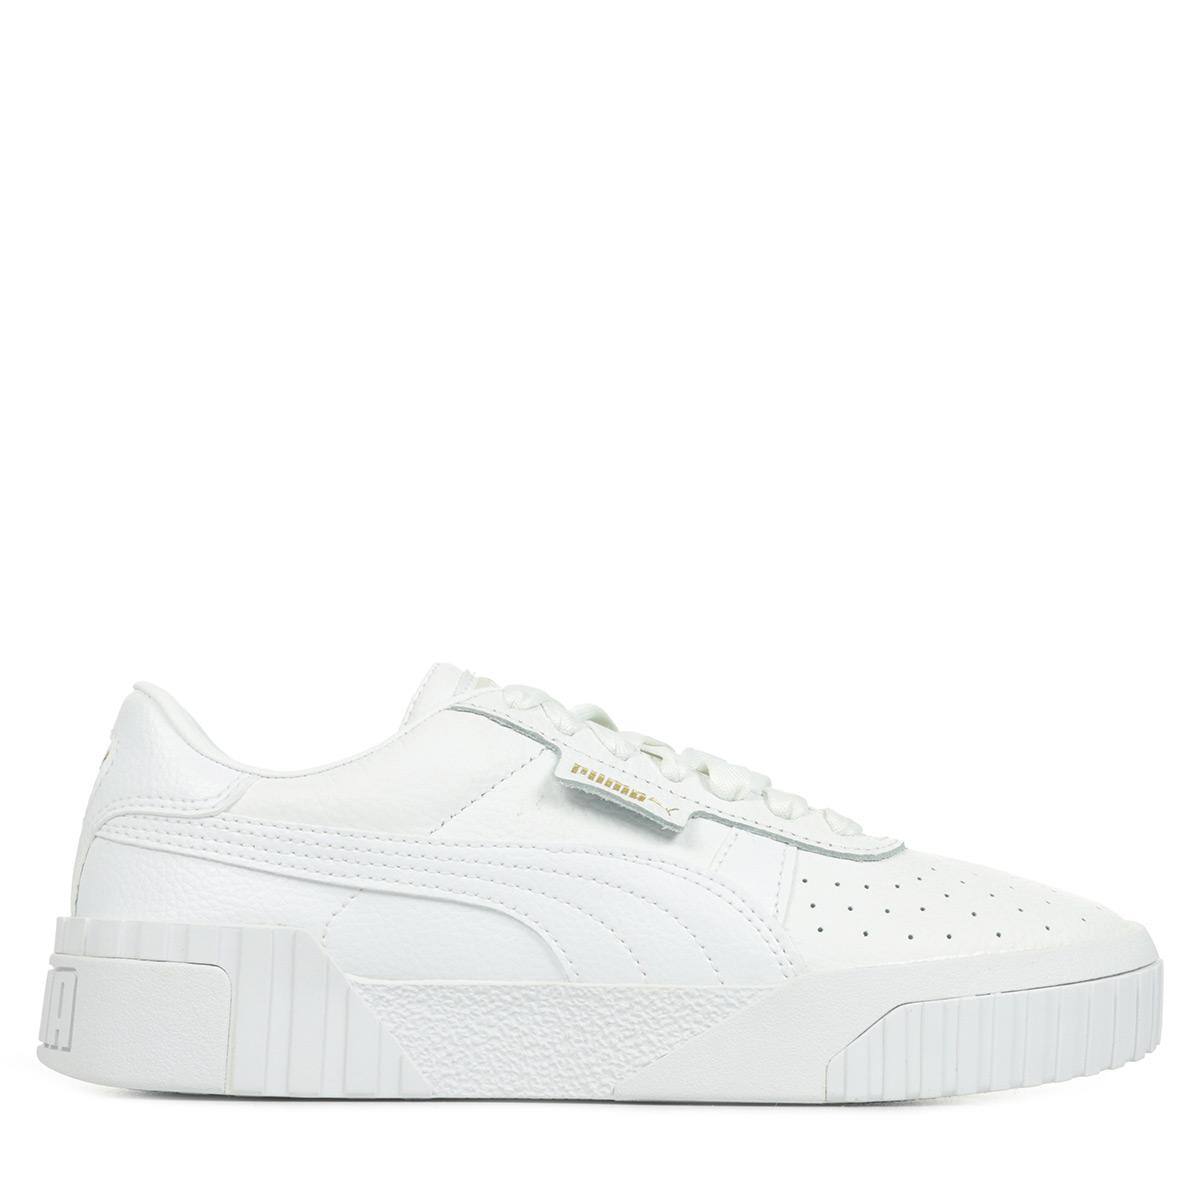 6f845788415fc Puma Cali Fashion Wn's 36915501, Baskets mode femme